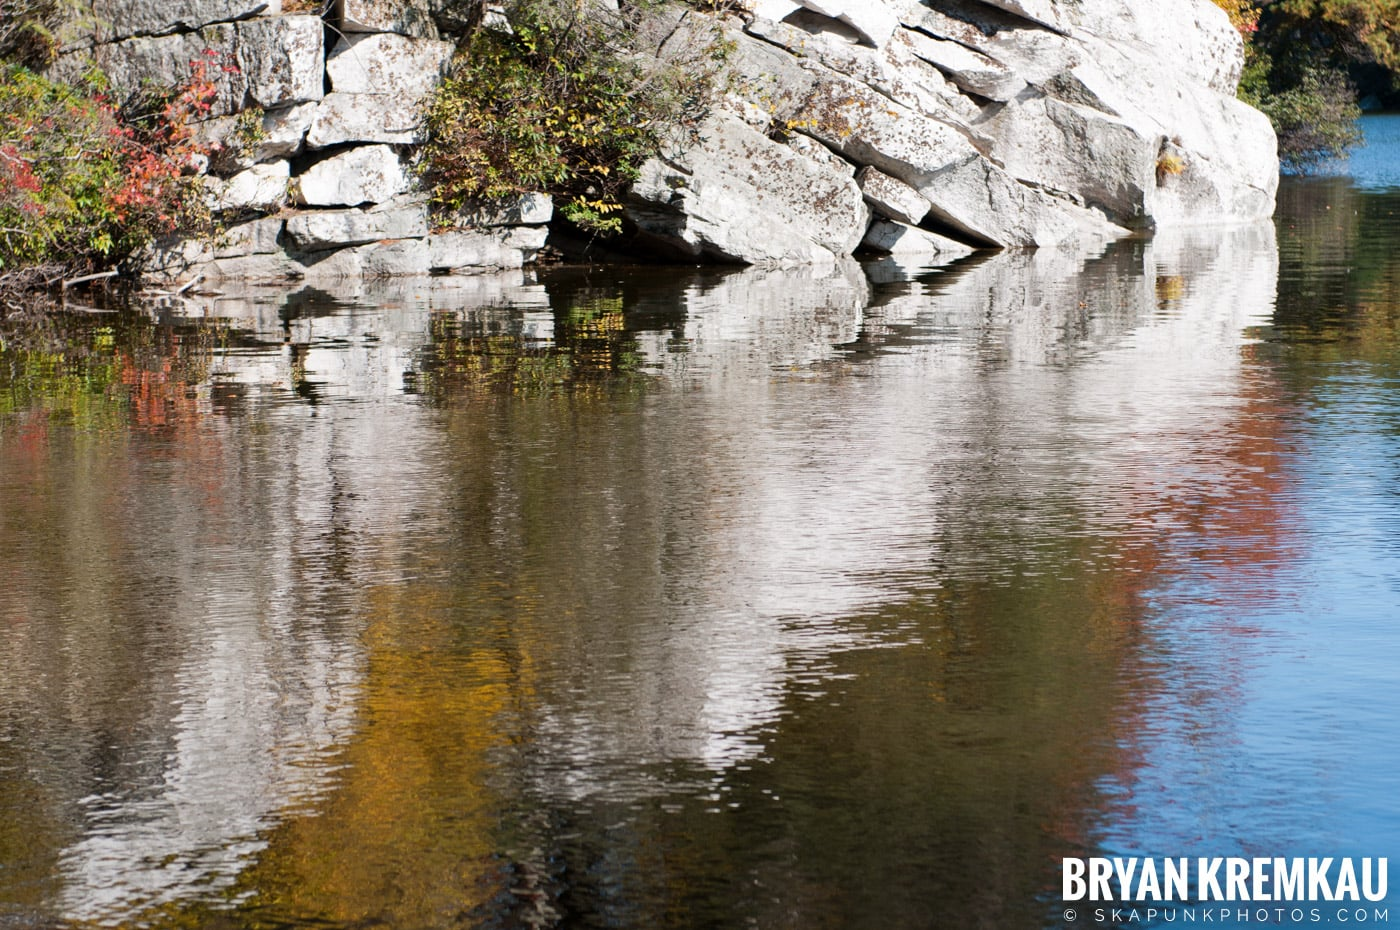 Minnewaska State Park Preserve @ Wawarsing, New York - 10.22.11 (9)